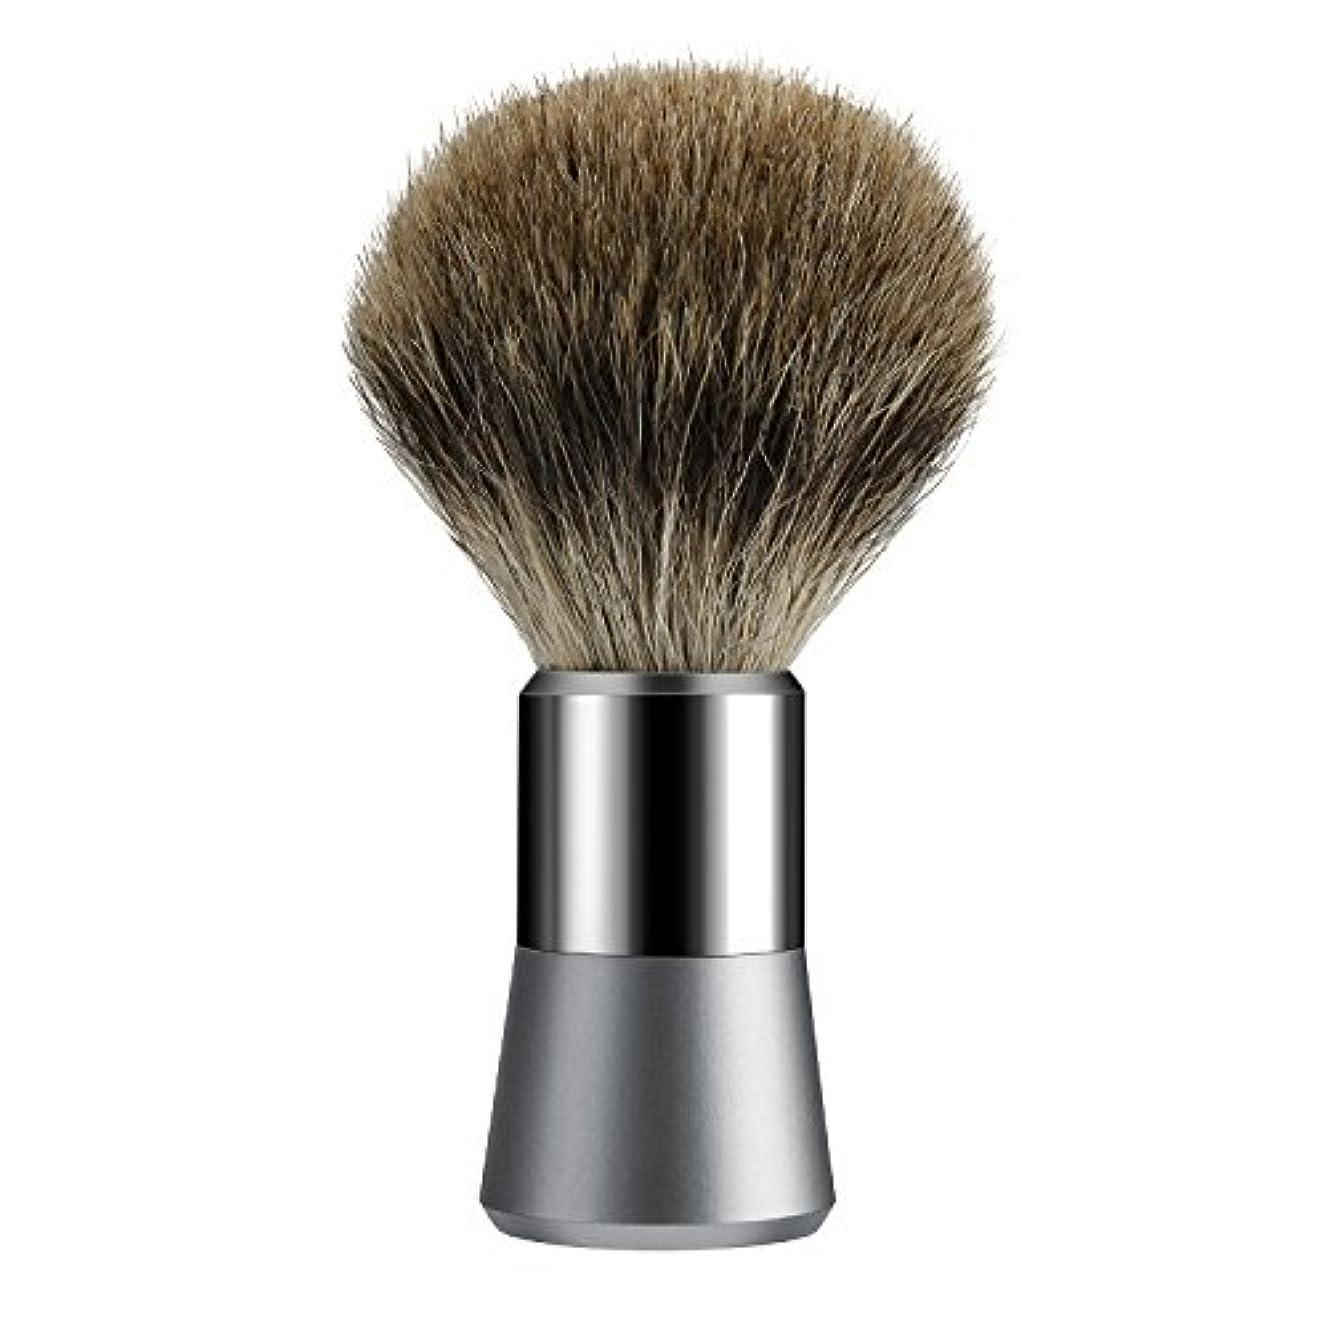 Tezam シェービング ブラシ, シェービングブラシ アナグマの毛 100%, クロームハンドル